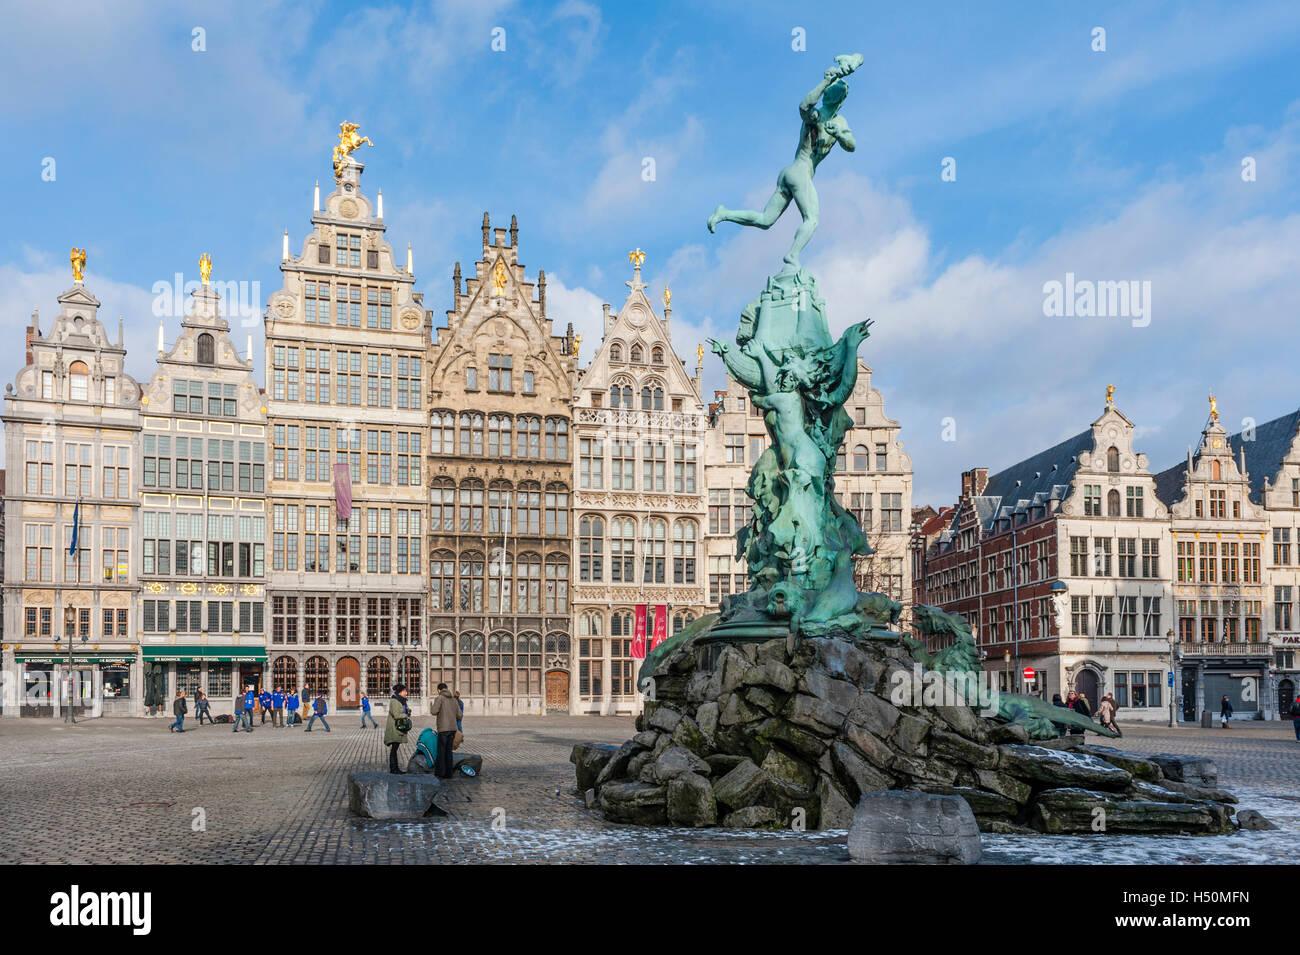 Antwerp; Brabo Fountain and historic buildings in Grote Markt square in Antwerp Belgium Stock Photo